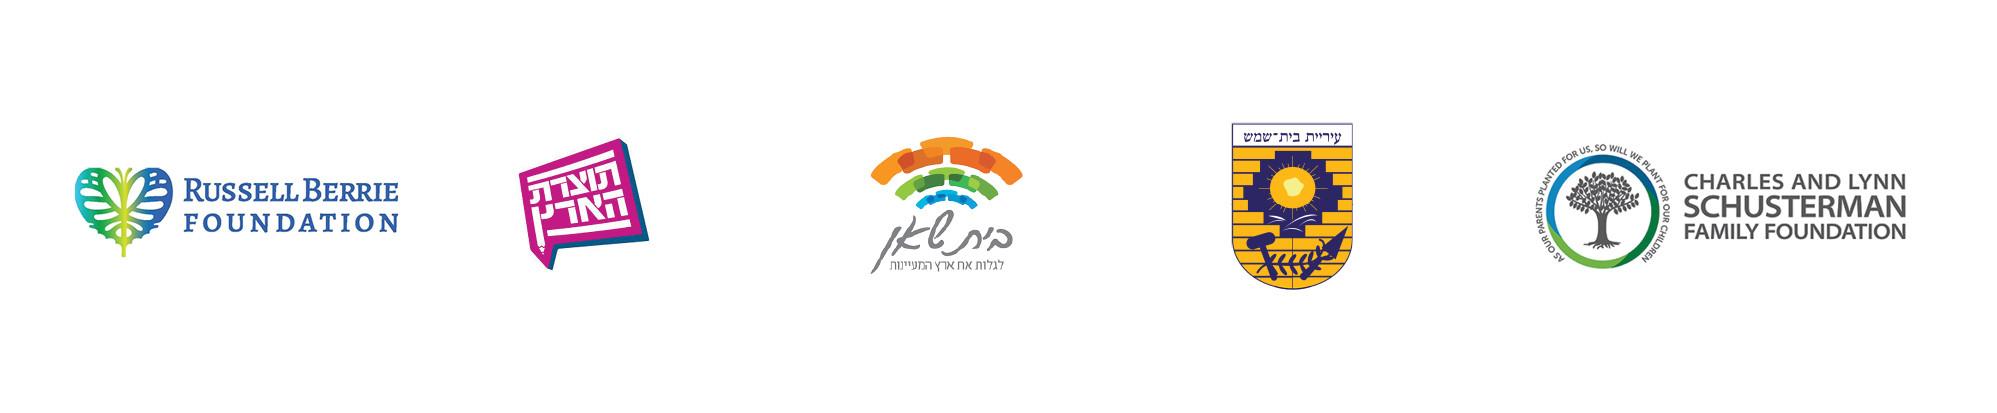 logos_in_line_2021_B.jpg